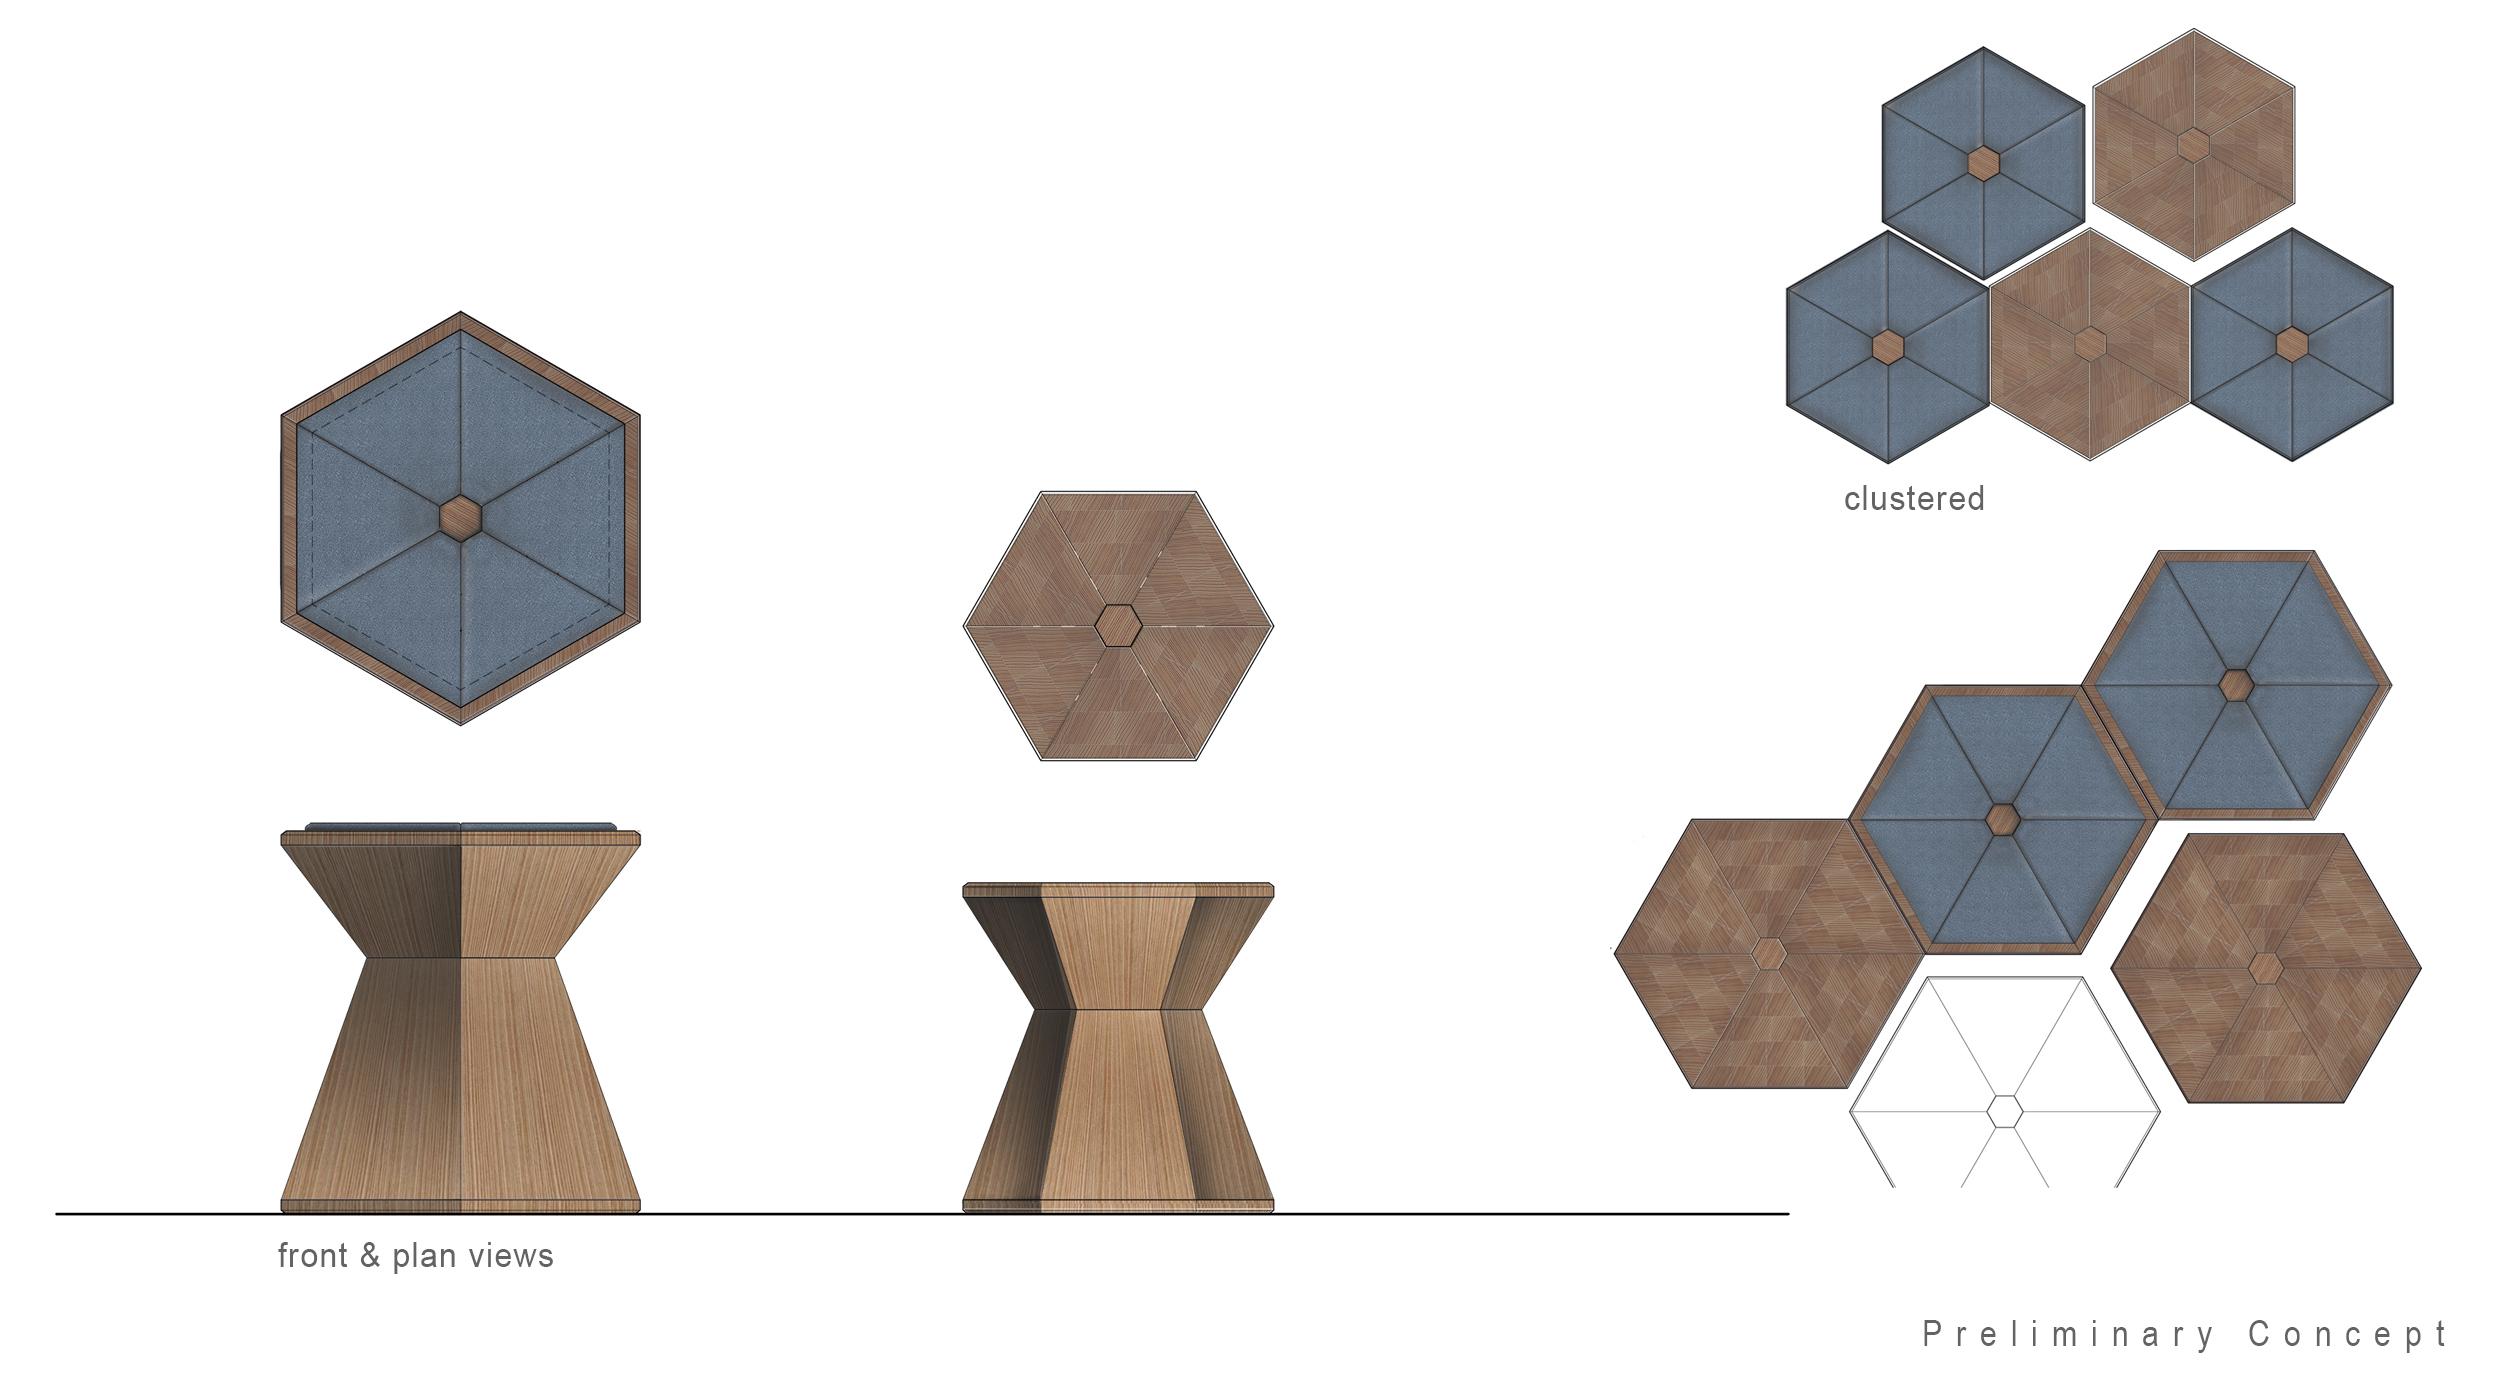 honeycomb_006.jpg